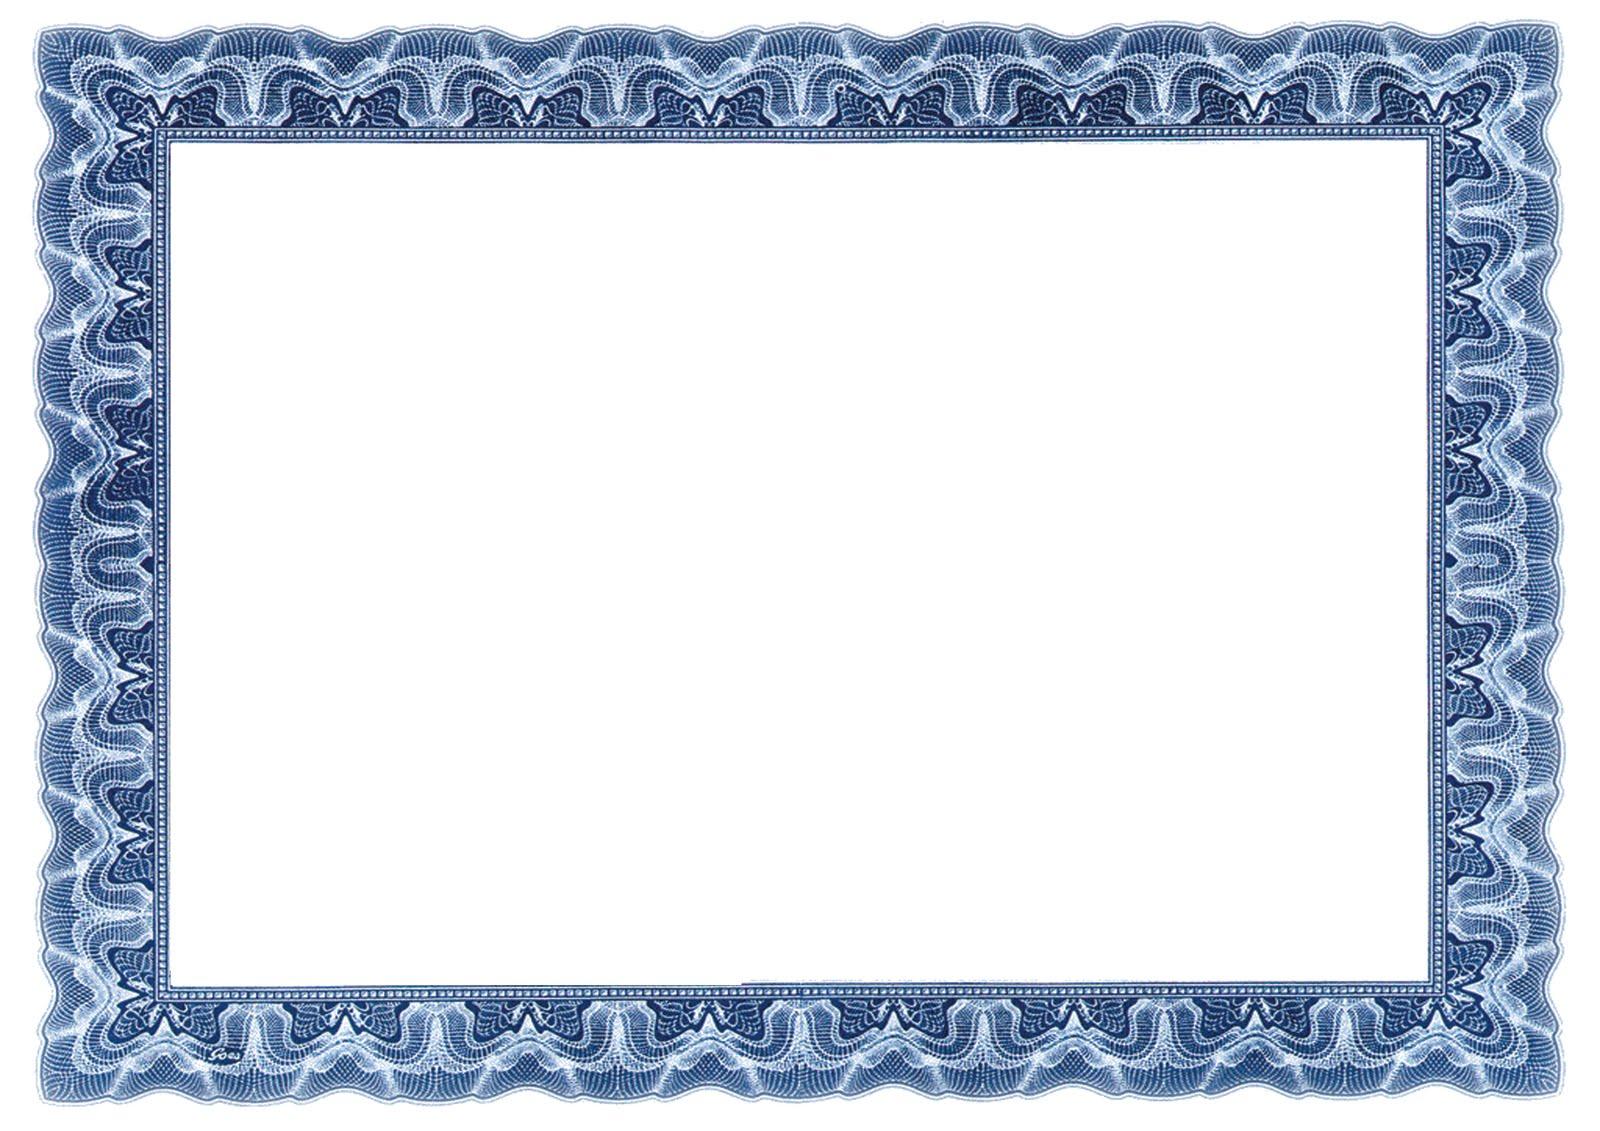 sertifikat bingkai sertifikat ijazah 006 jpg bingkai sertifikat ...